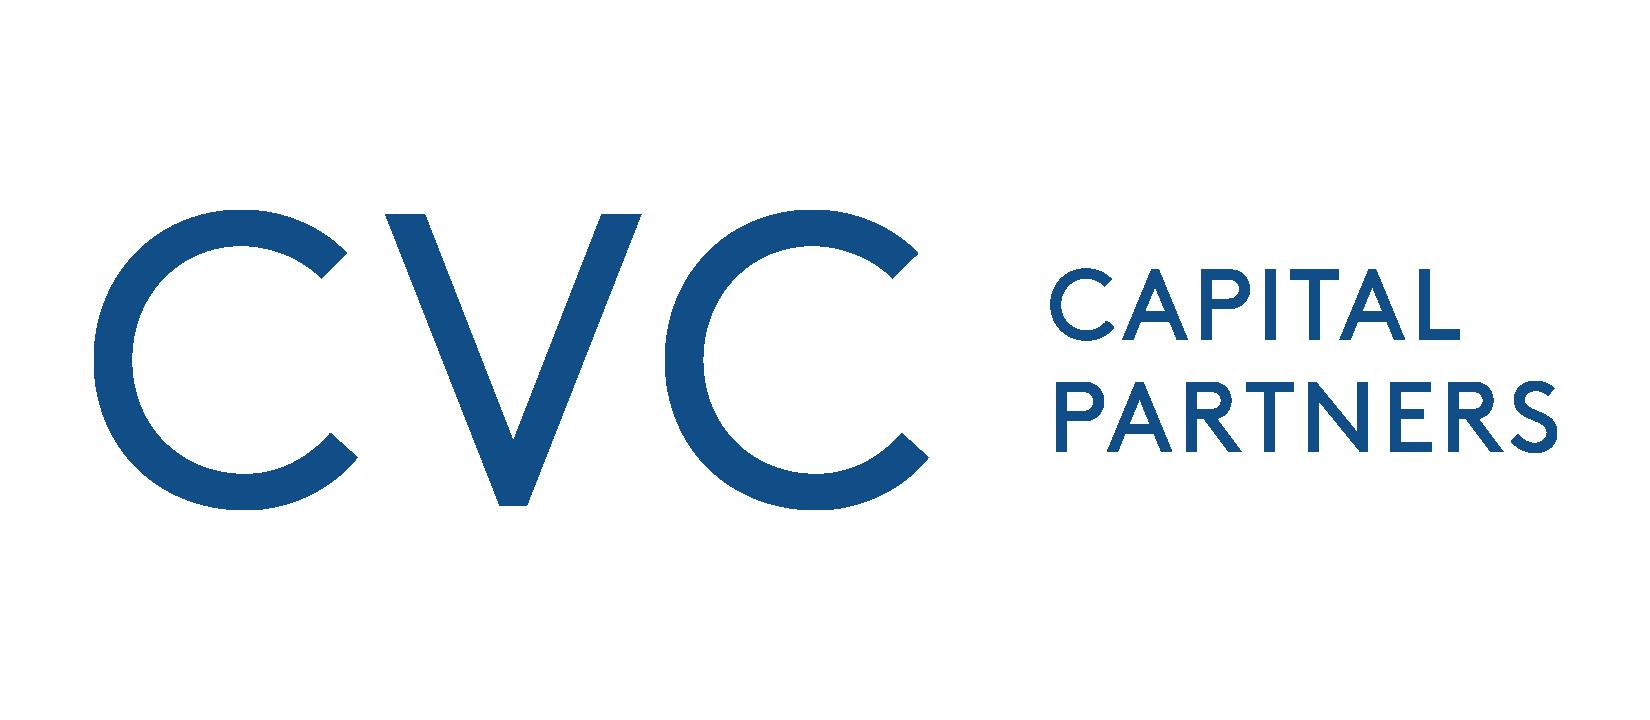 CVC Capital Partners - Wikipedia